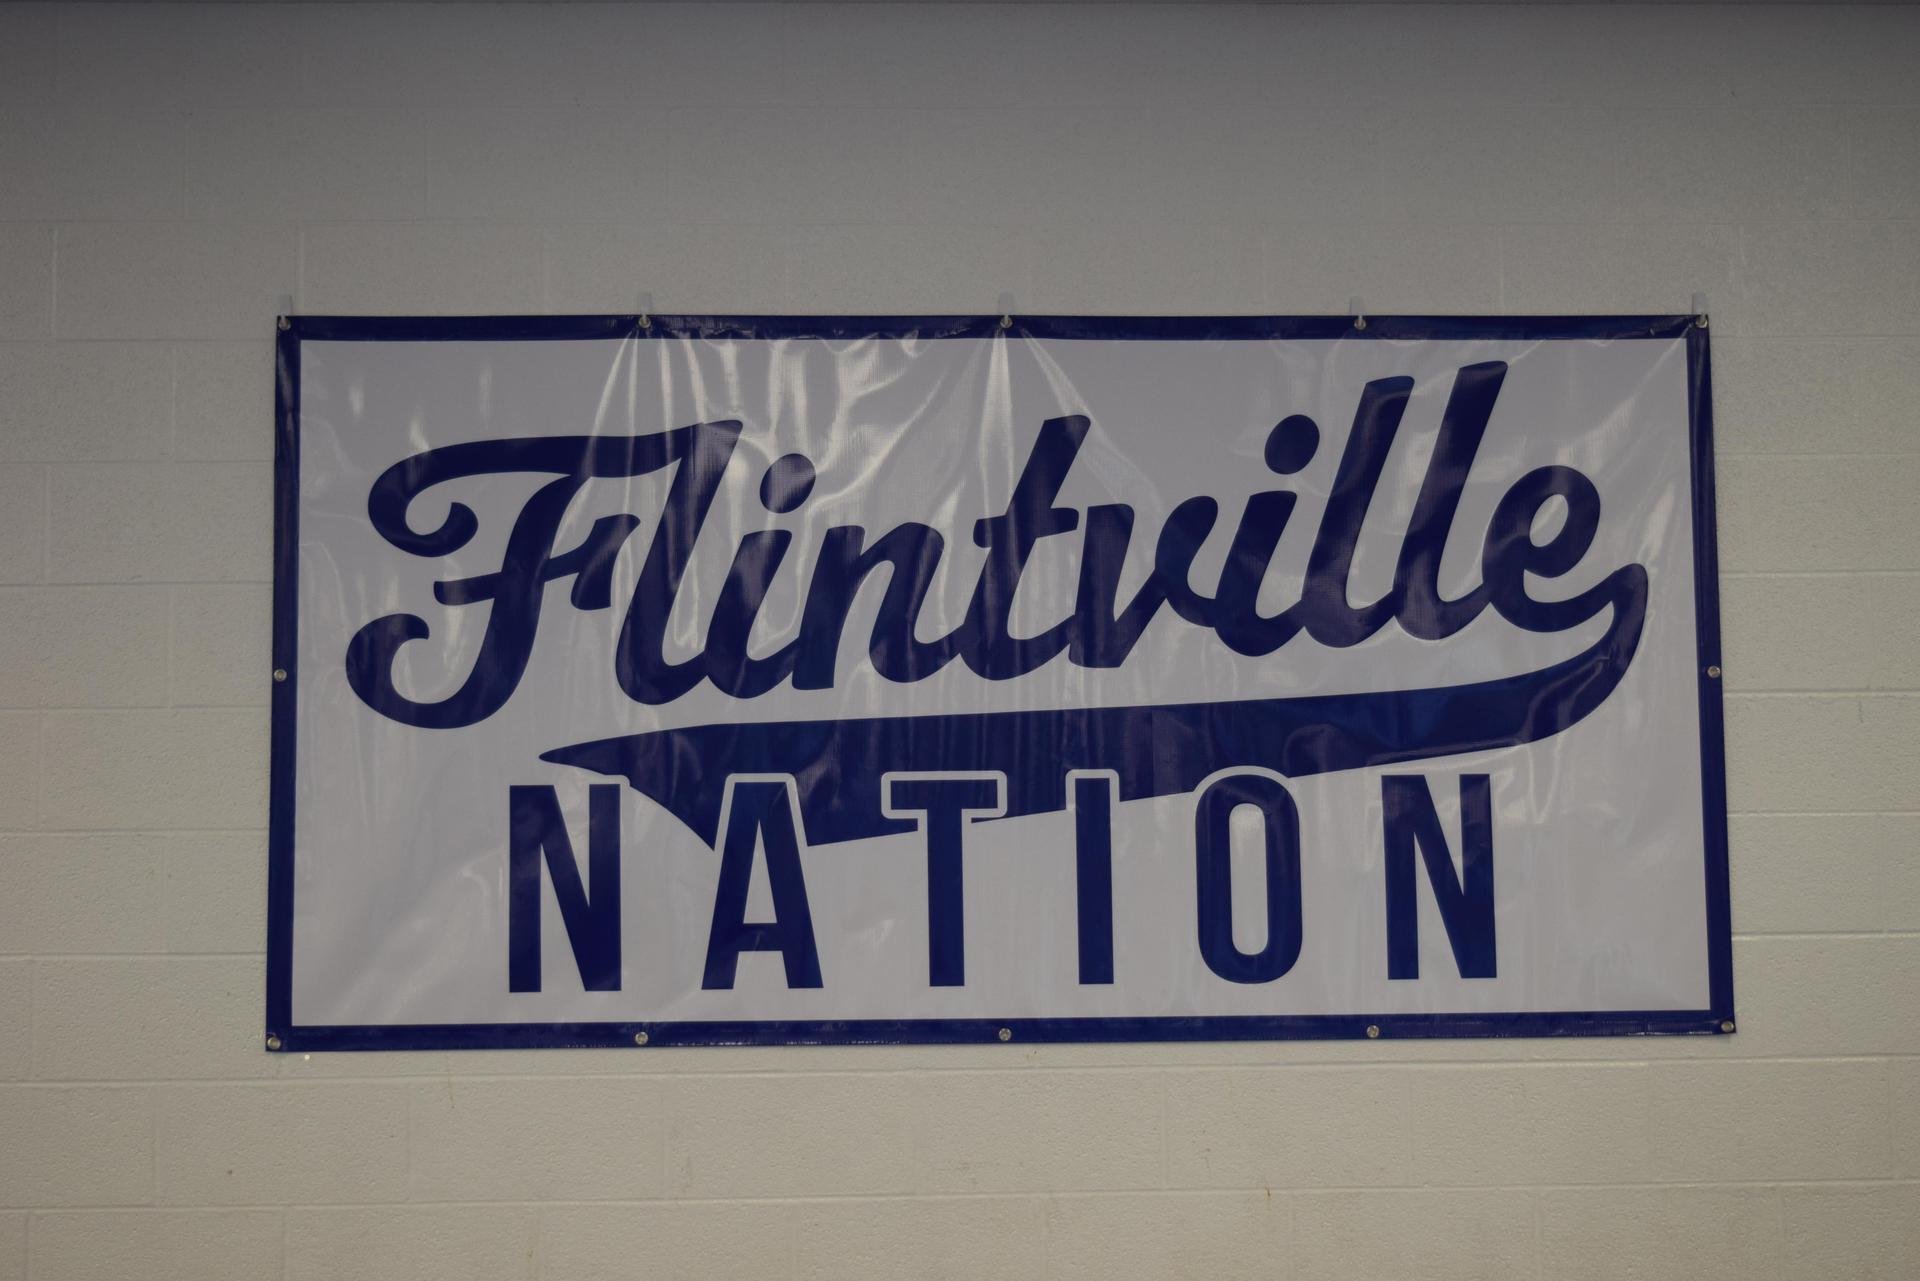 flintville nation